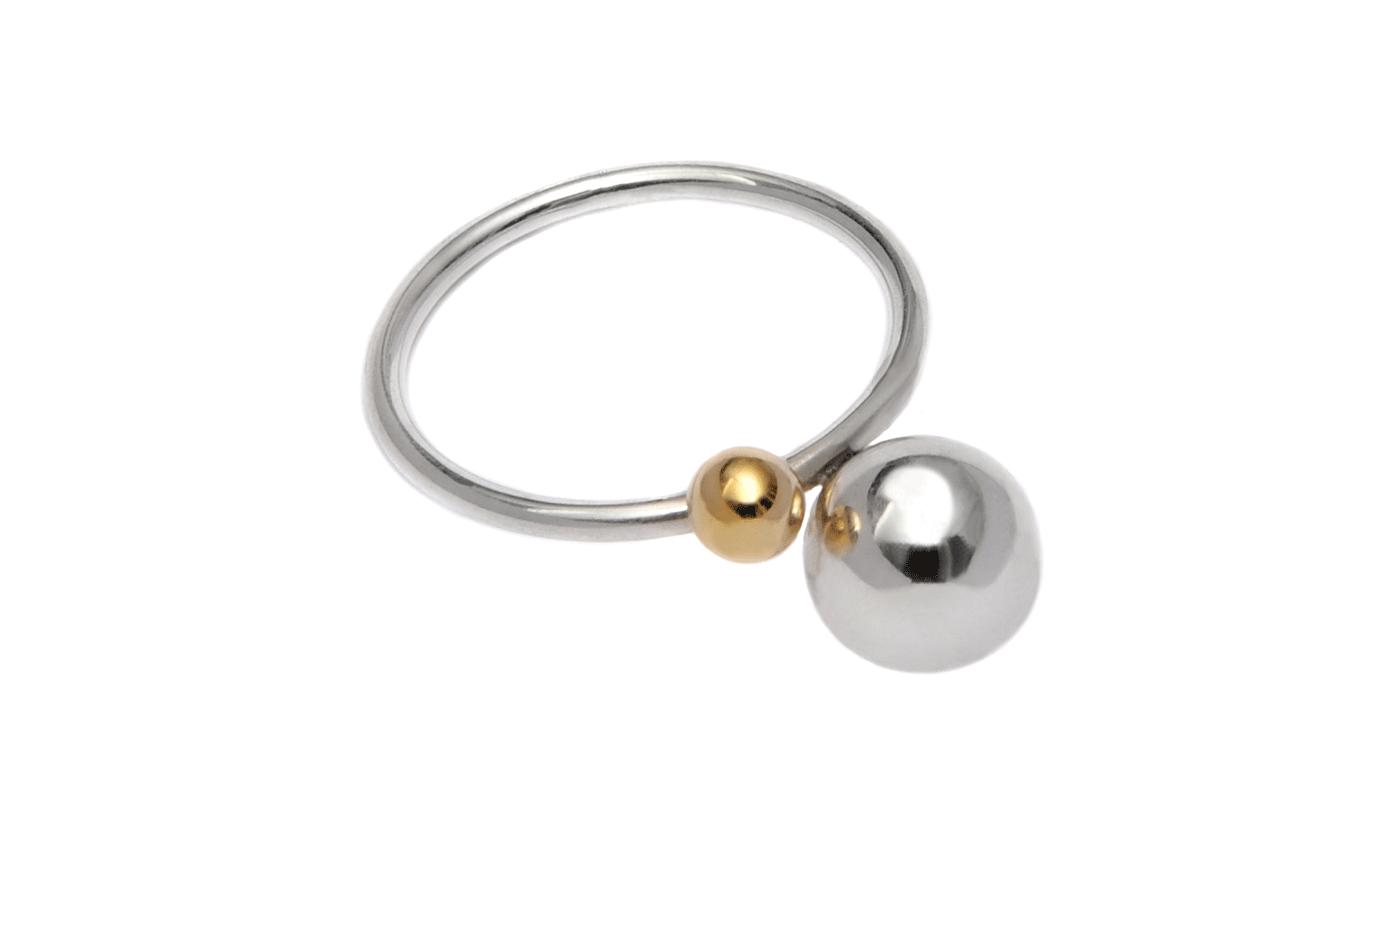 Adeline Cacheux Jewelry Design Bague Argent